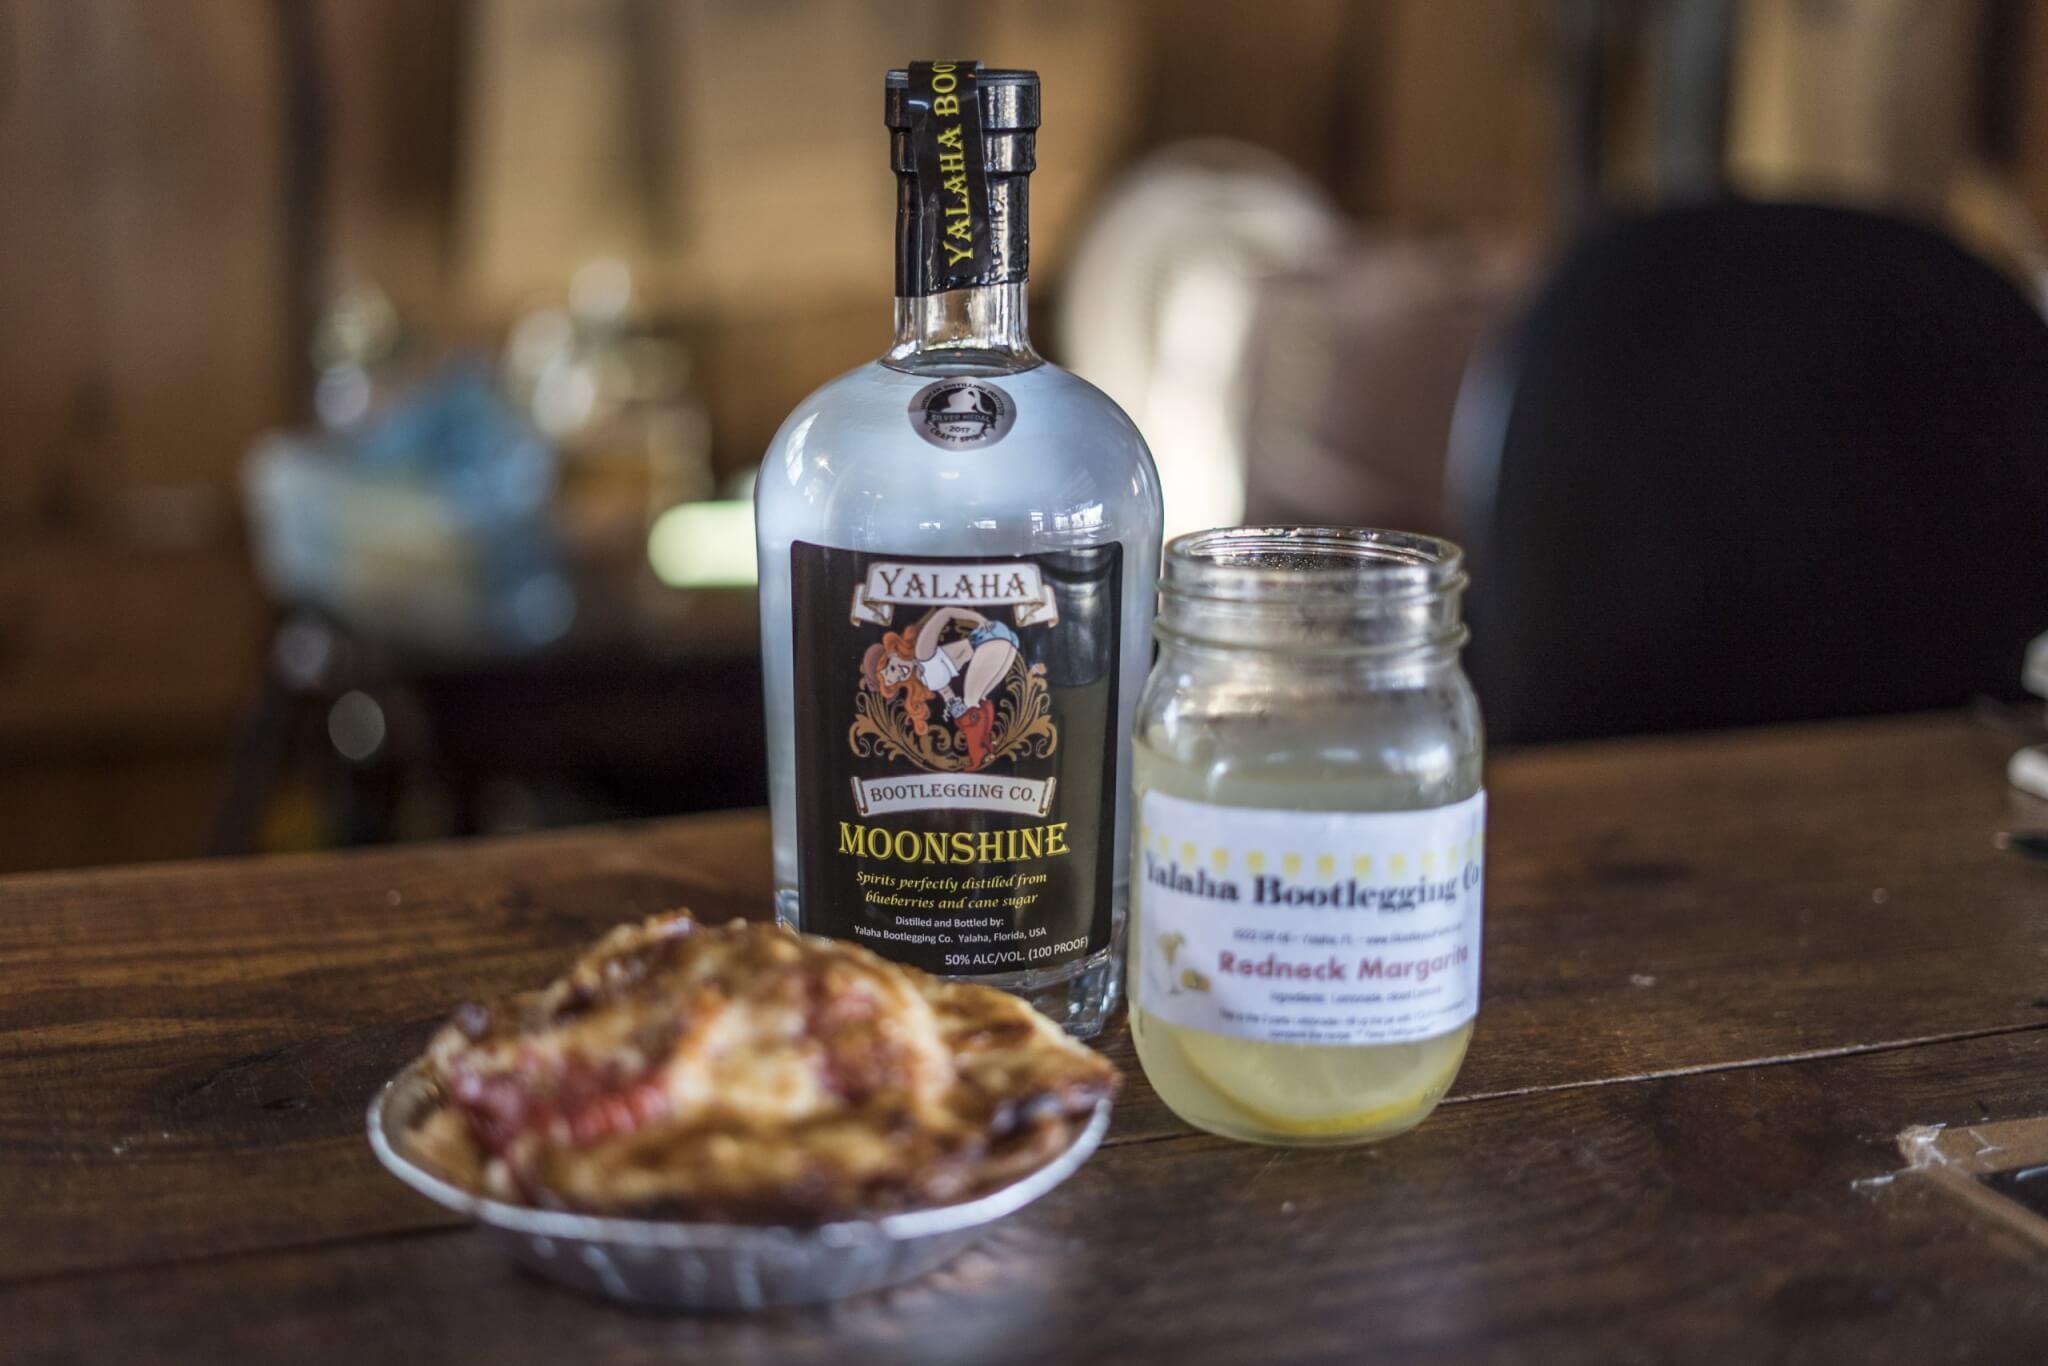 Photo of moonshine bottle and mason jar glass beside a baked pie from the Yalaha Bakery.